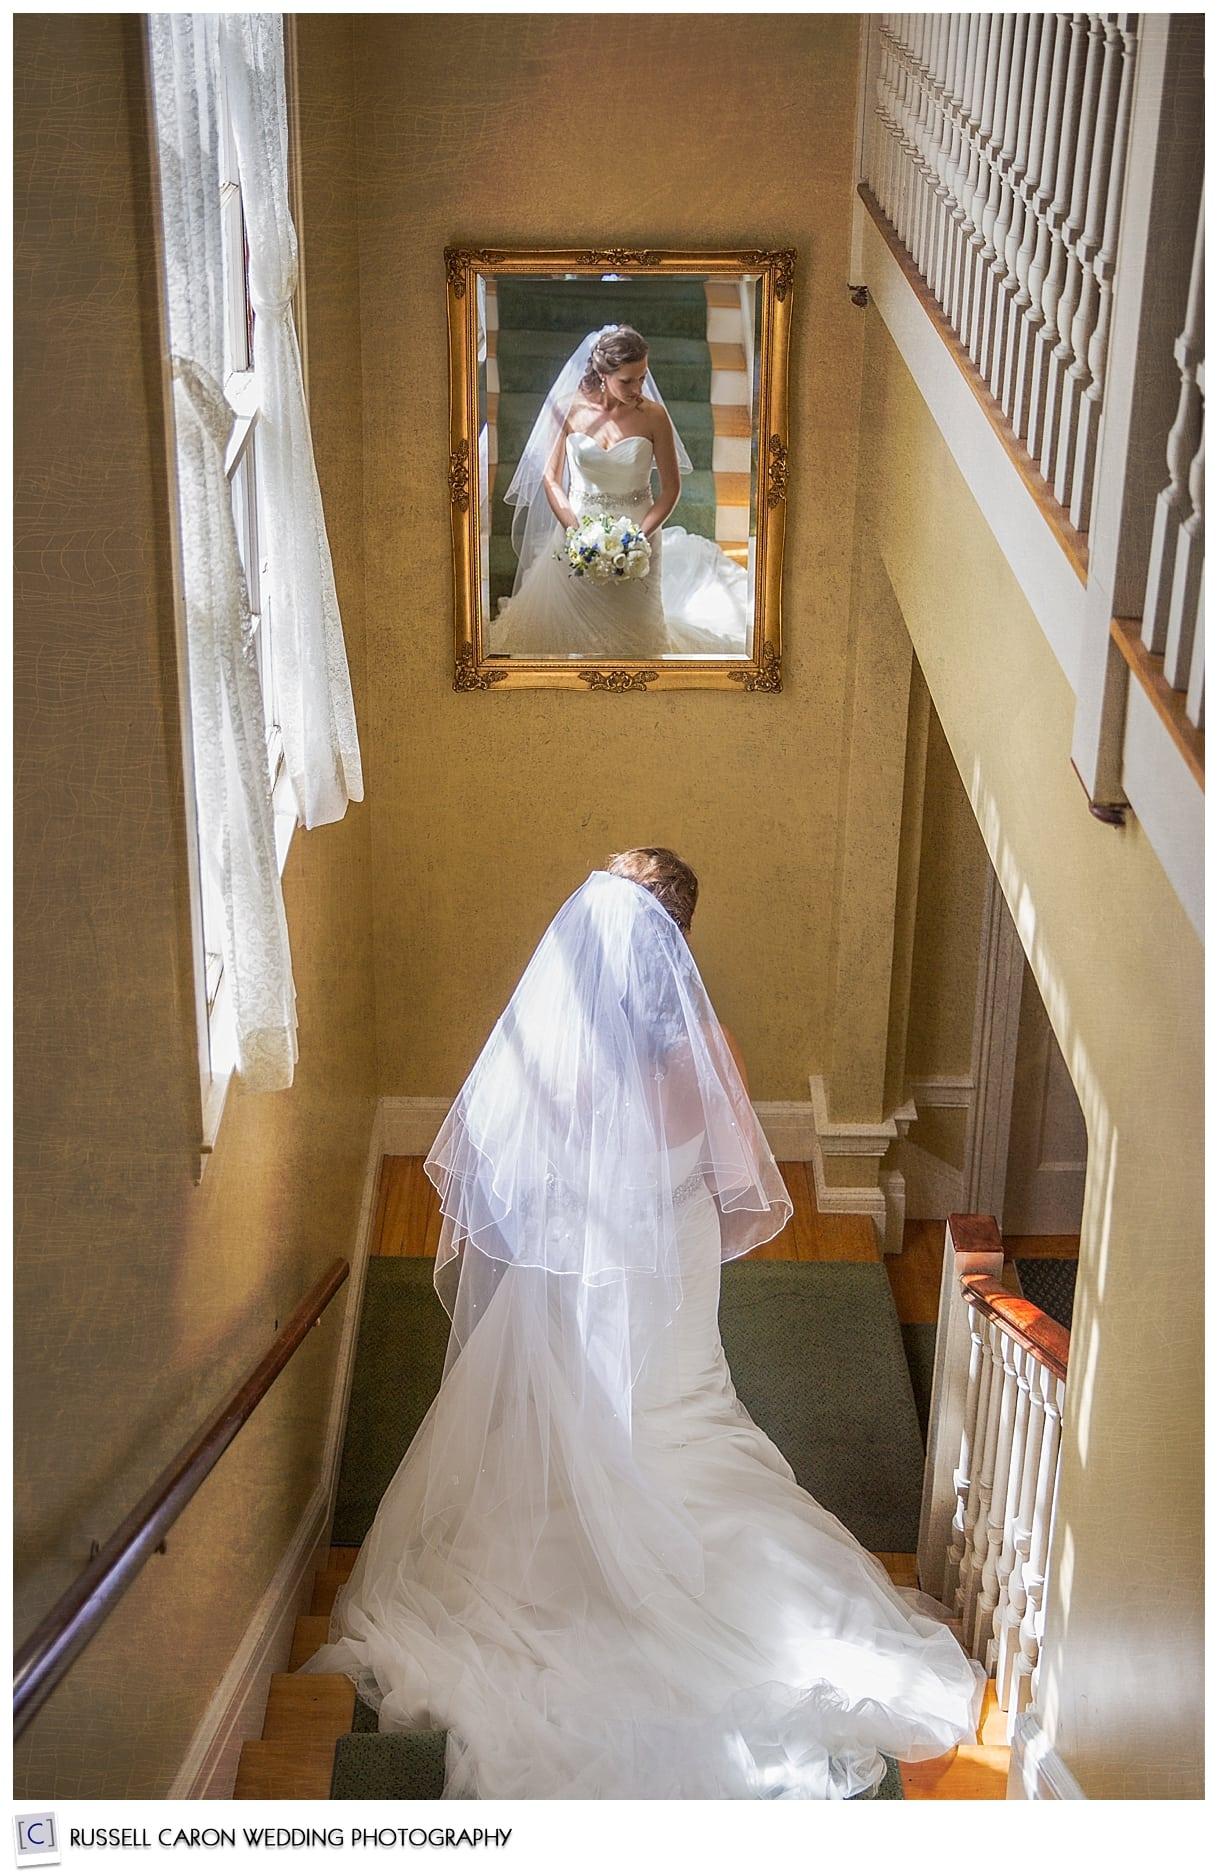 Bride descending stairs